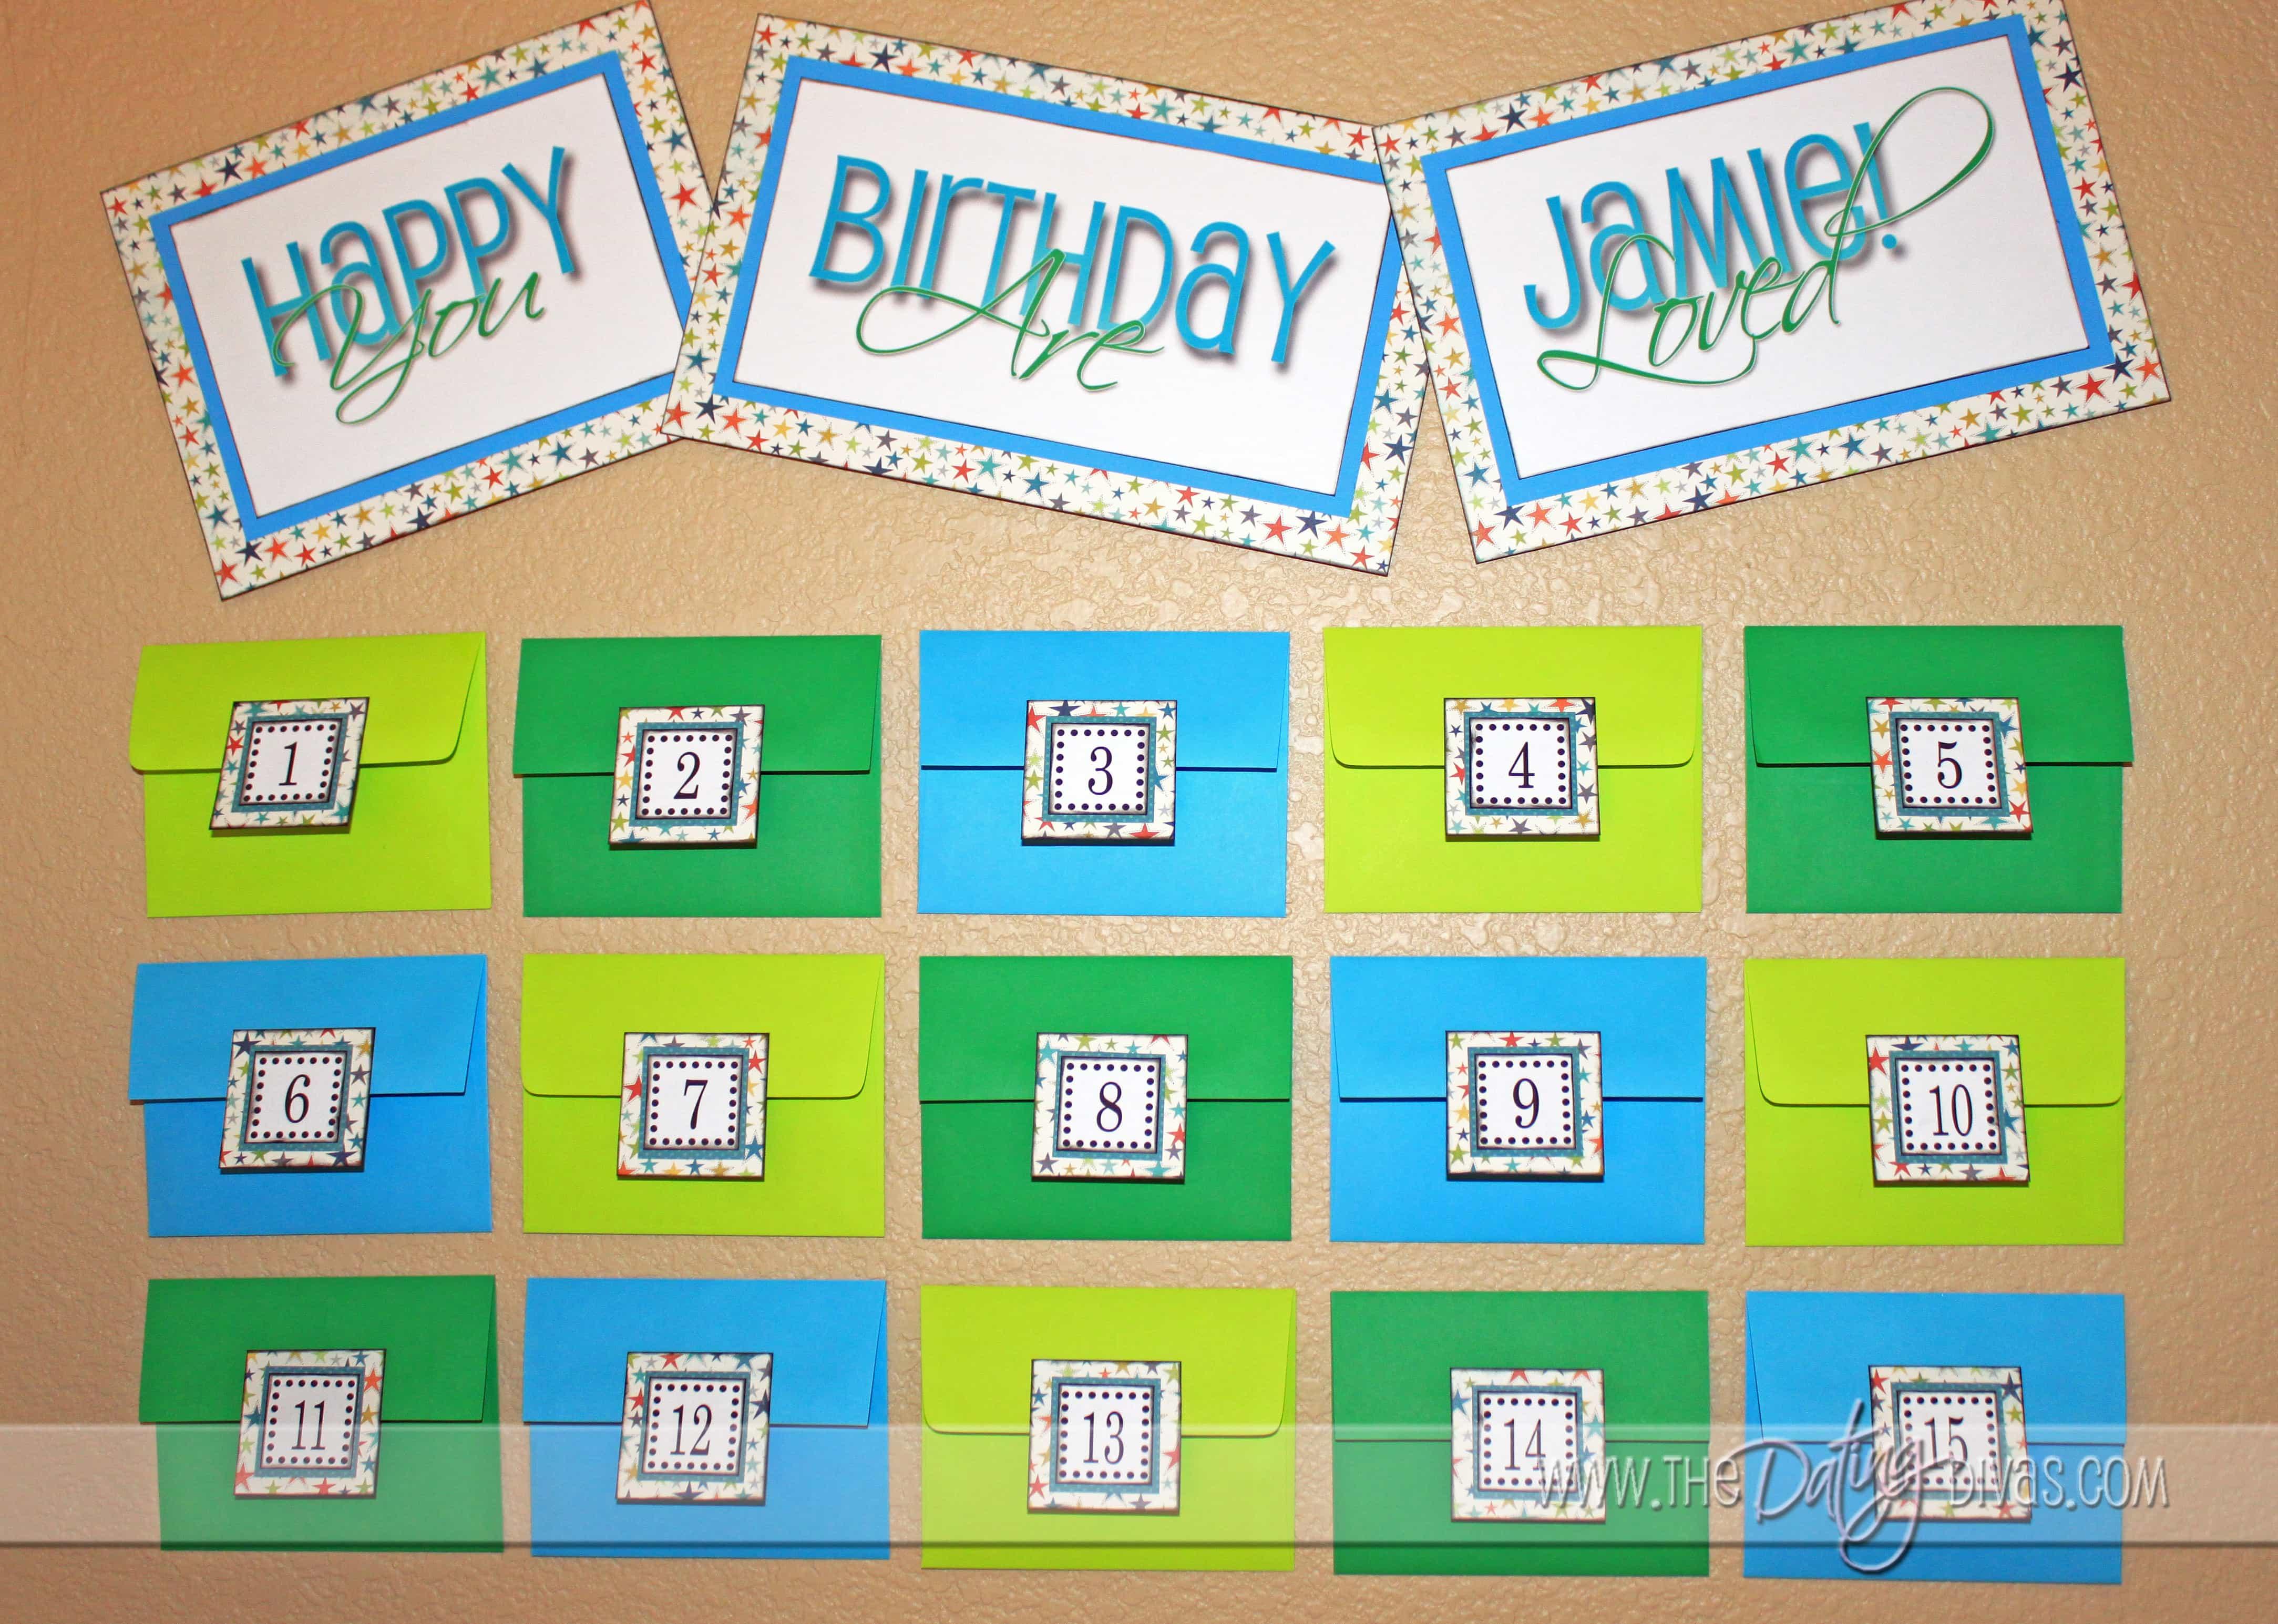 You ARE Appreciated Birthday Gift